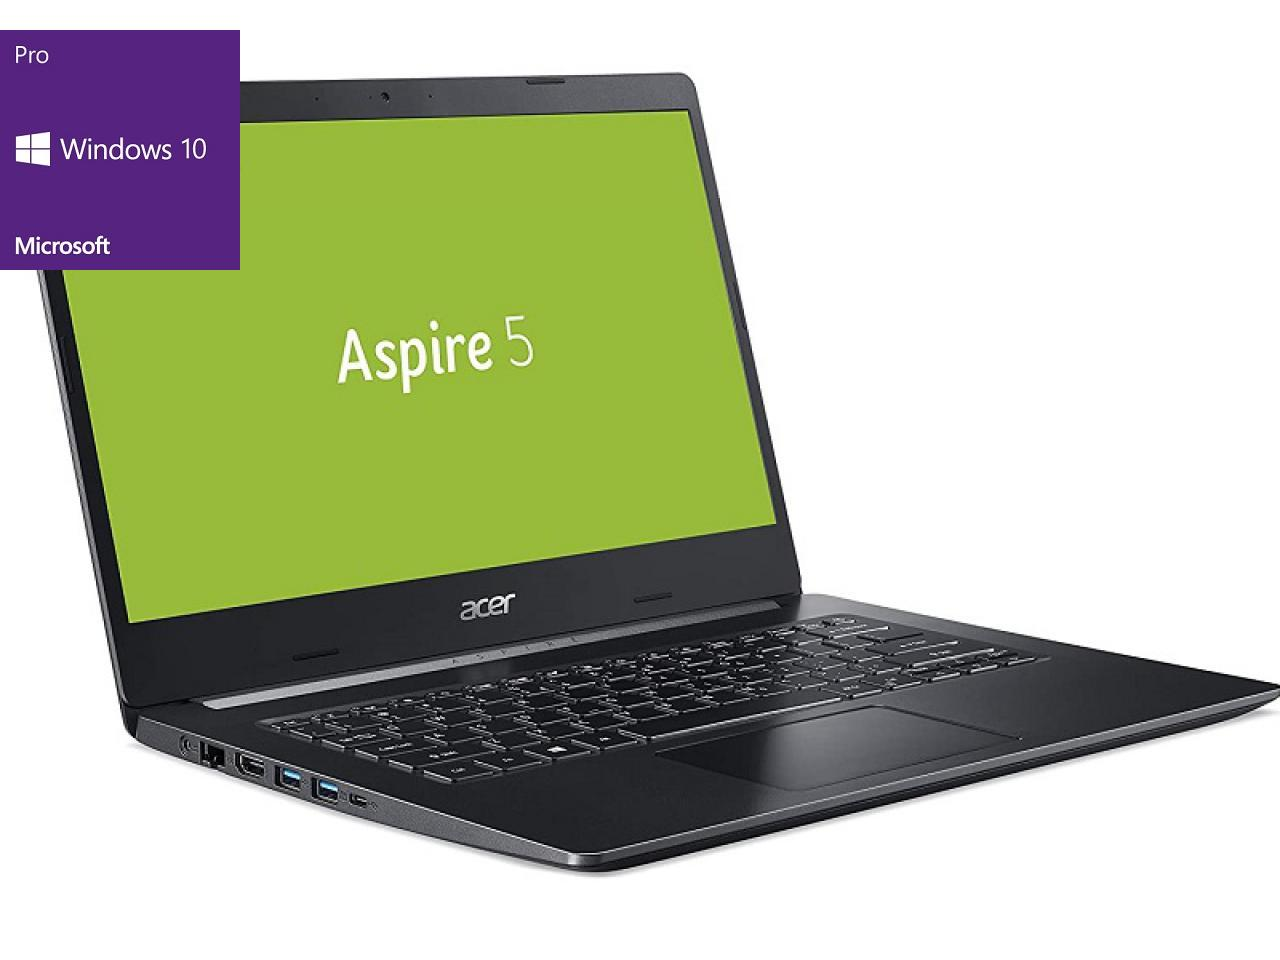 Acer Aspire 5 A514-52-35JS  - shop.bb-net.de